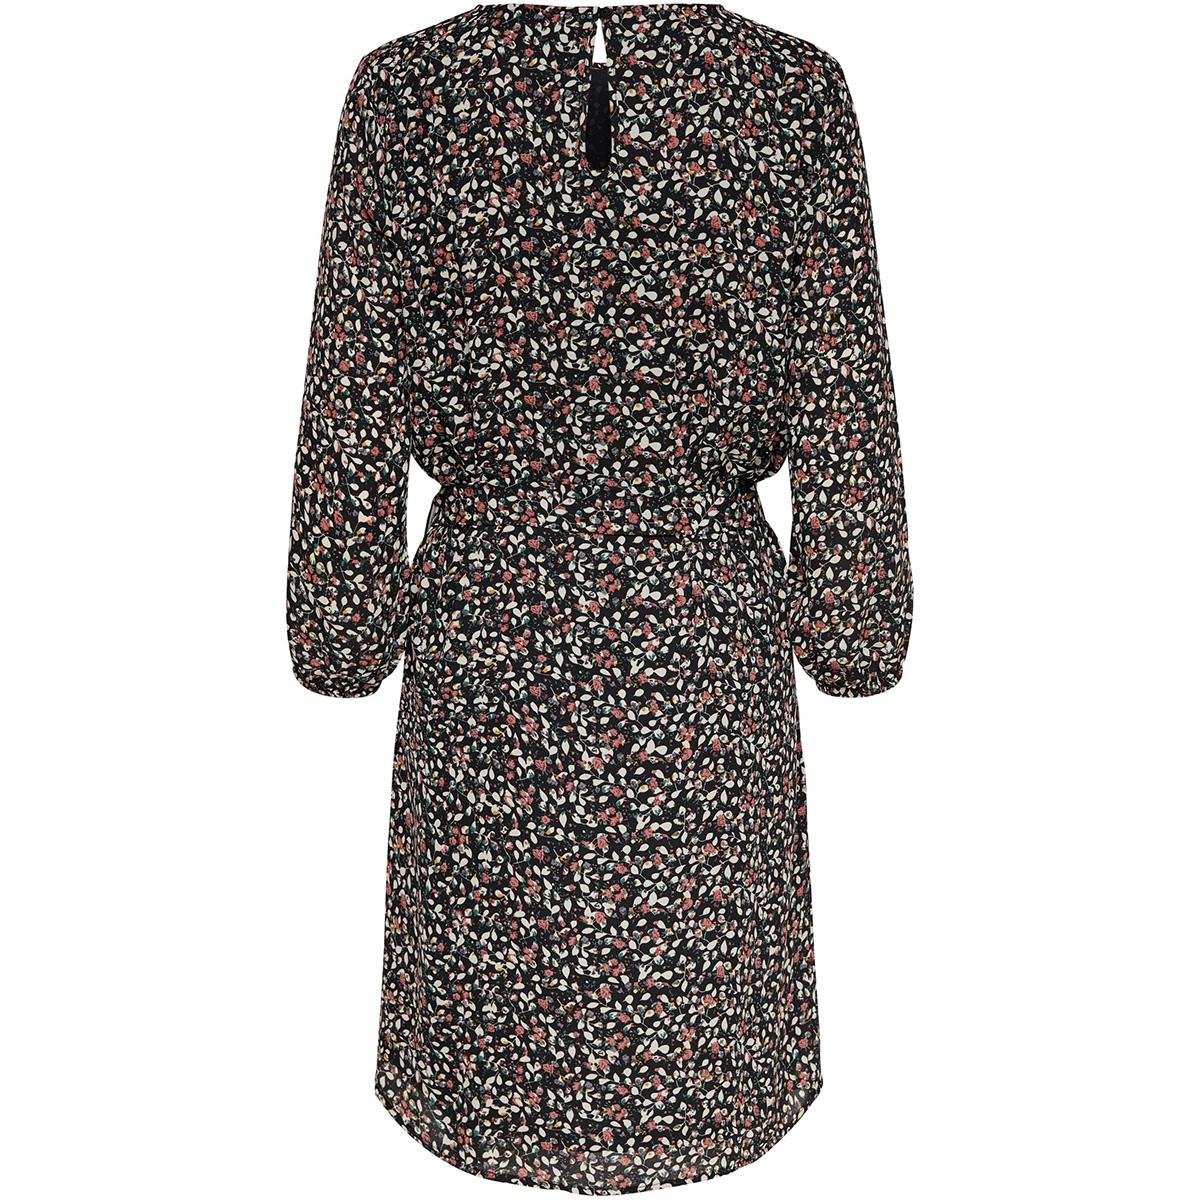 jdynikky 7/8 dress wvn 15188898 jacqueline de yong jurk black/small leaves